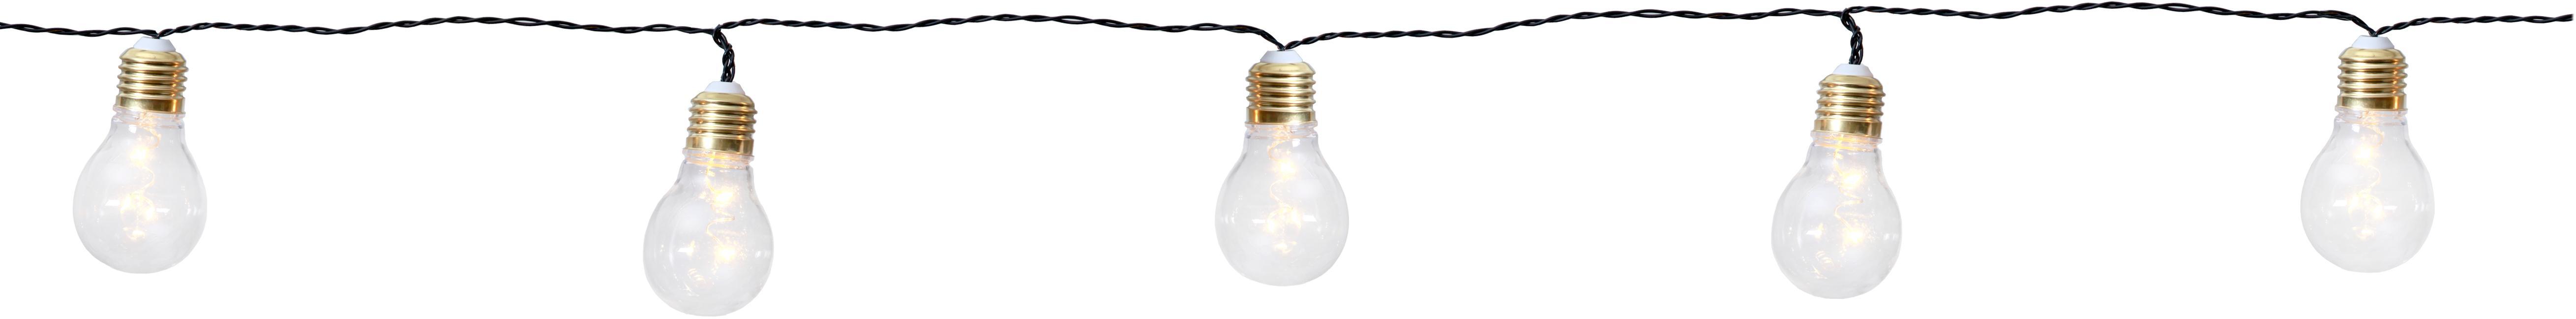 Kurze LED Lichterkette Bulb, 100 cm, Leuchtmittel: Transparent, Goldfarben<br>Kabel: Schwarz, L 100 cm